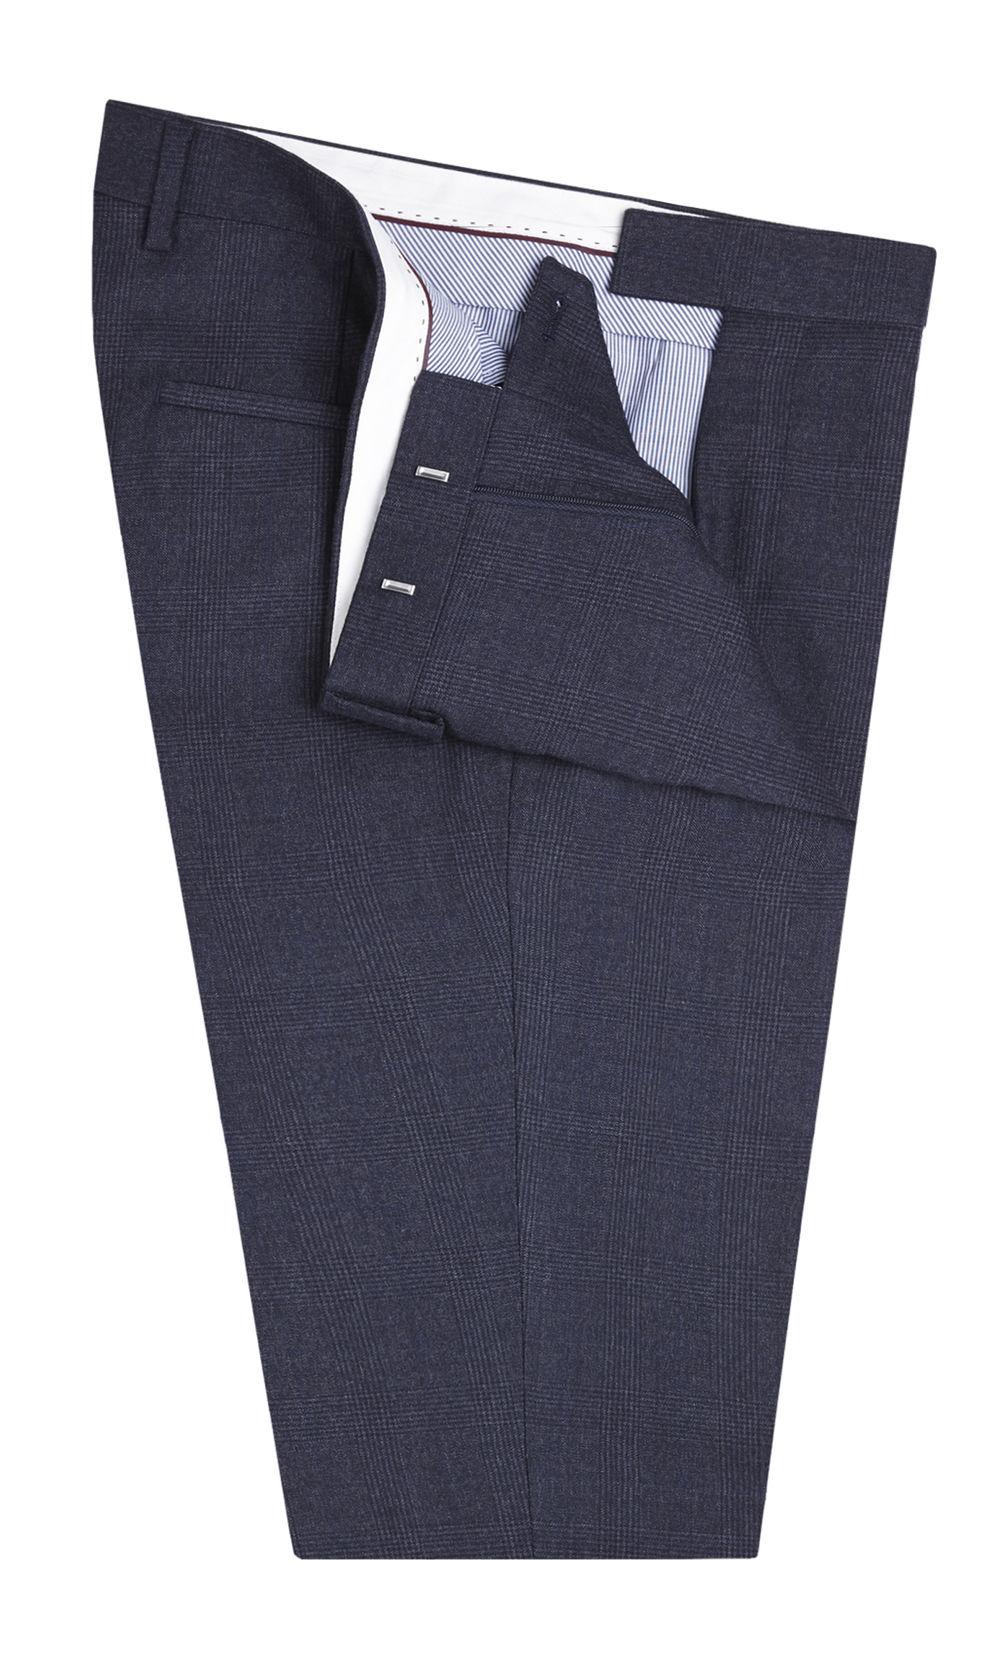 Wedding Slim Fit Suit in Indigo Check - Deji & Kola